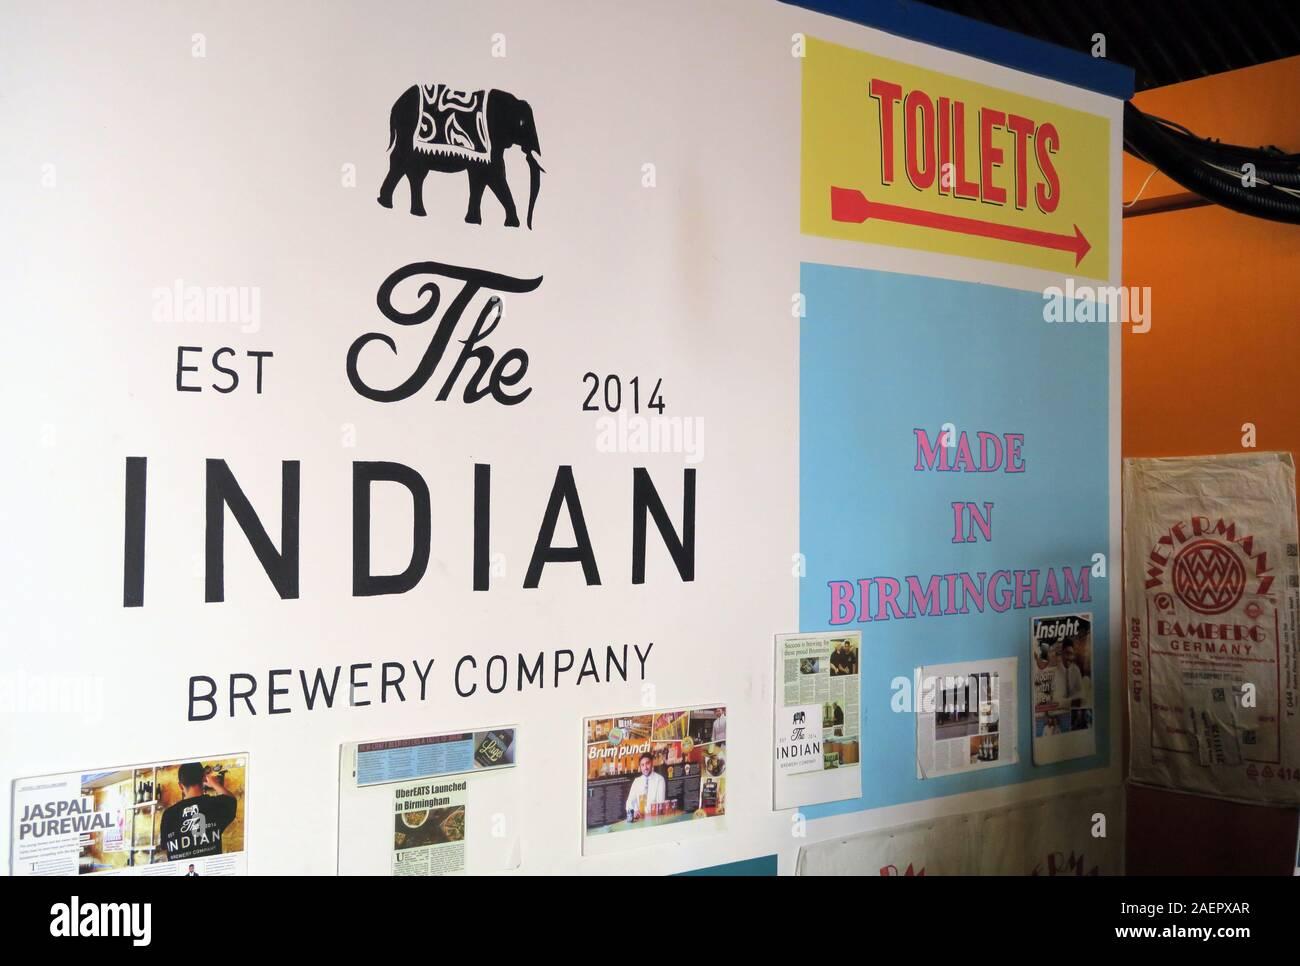 Dieses Stockfoto: The Indian Brewery Company, Snowhill, Arch 16 Livery Street, Birmingham, West Midlands, England, Großbritannien, B3 1EU - 2AEPXA